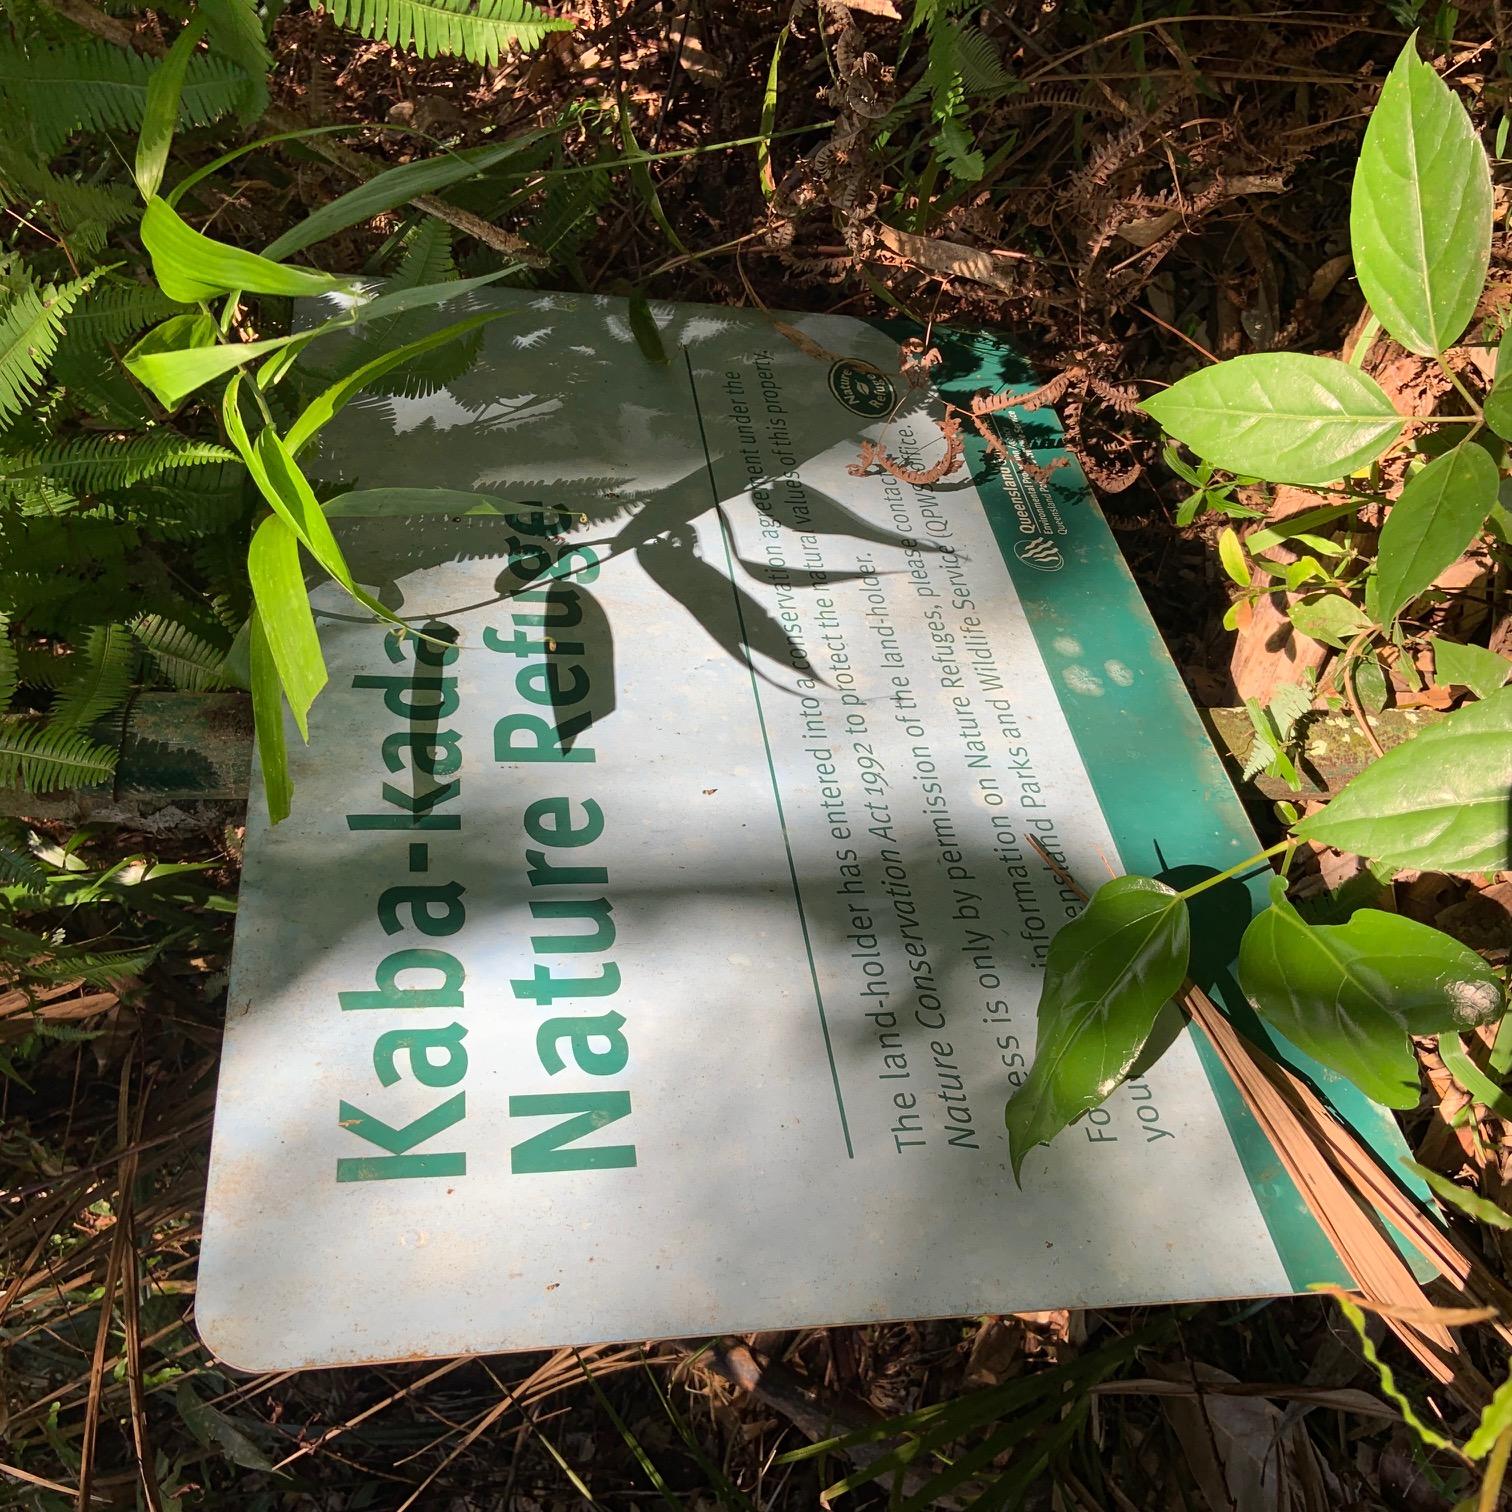 Kaba-kada Nature Refuge in the Daintree Rainforest